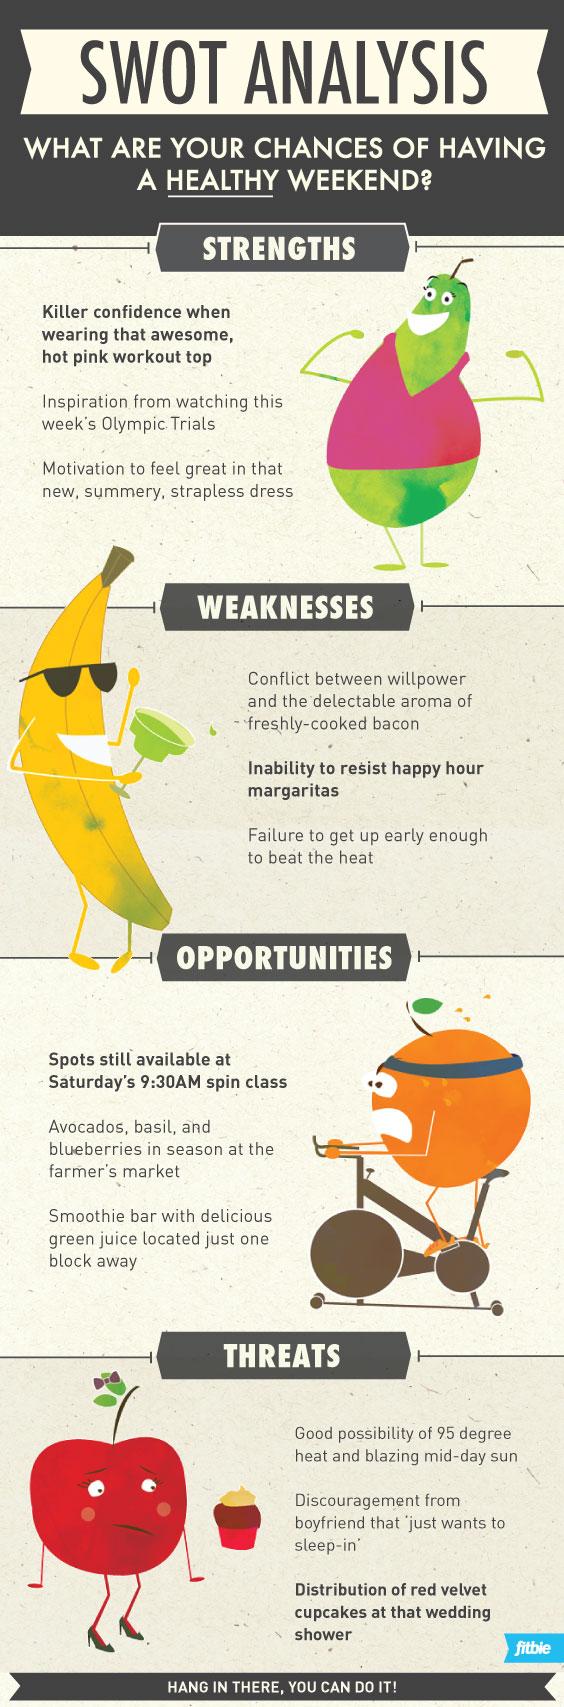 Healthy Vs Sluggish Weekend? Analyze Your Chances - Infographic